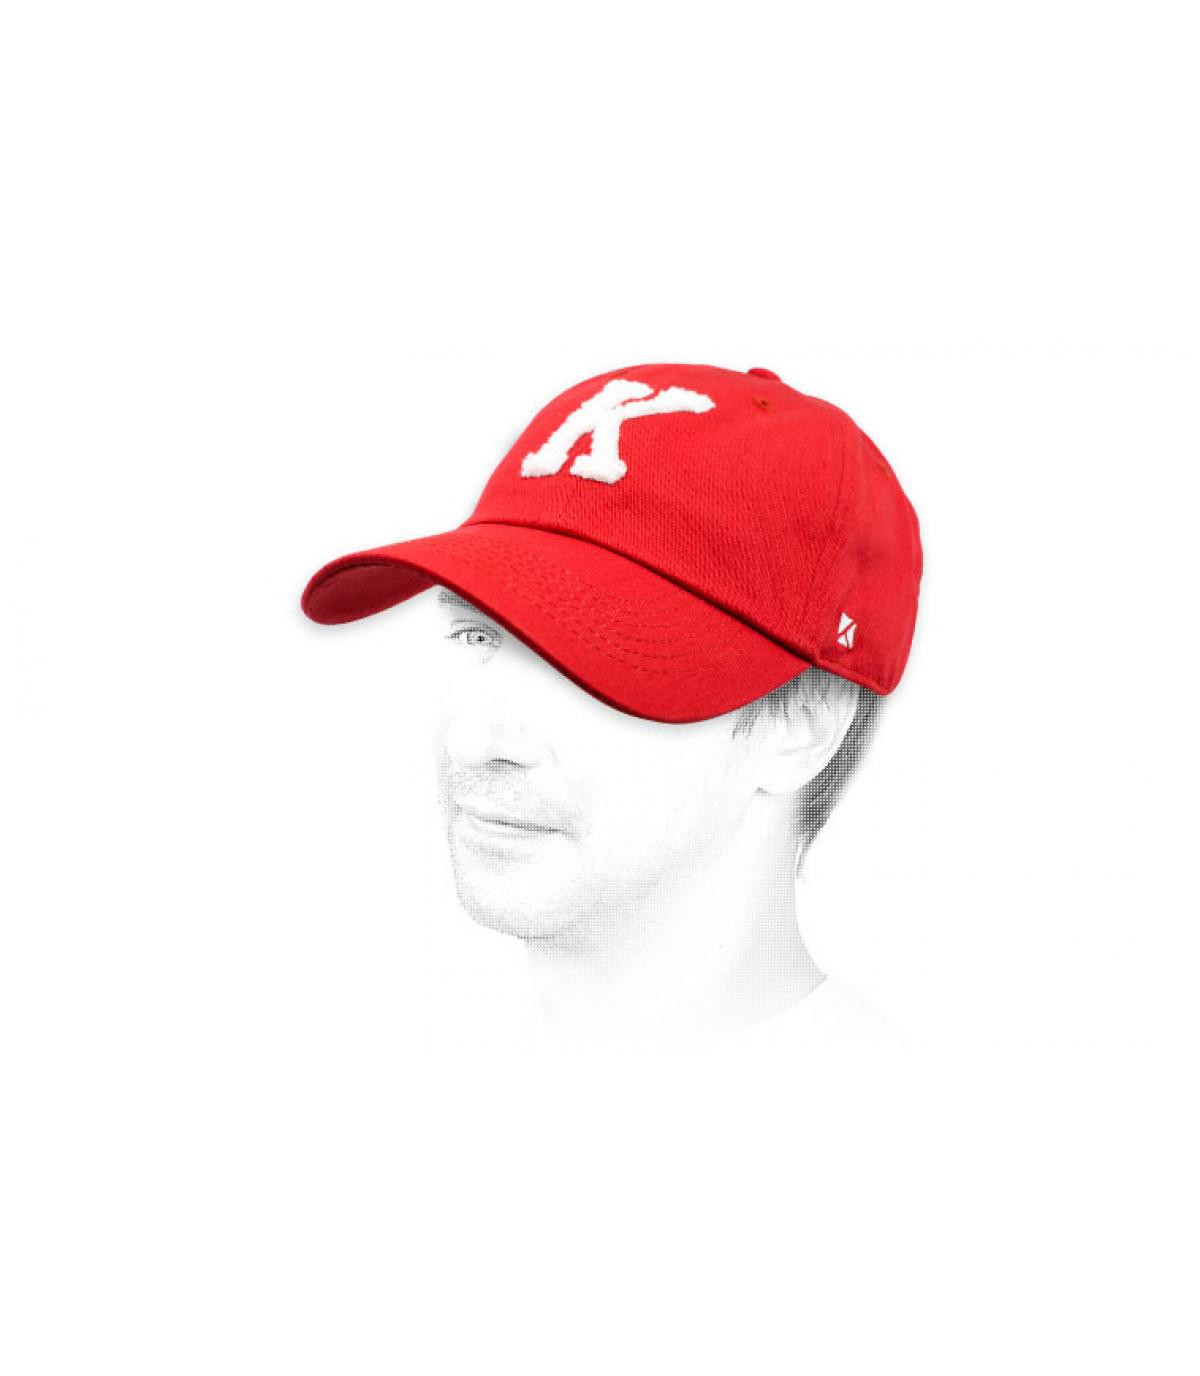 b bordeaux cap